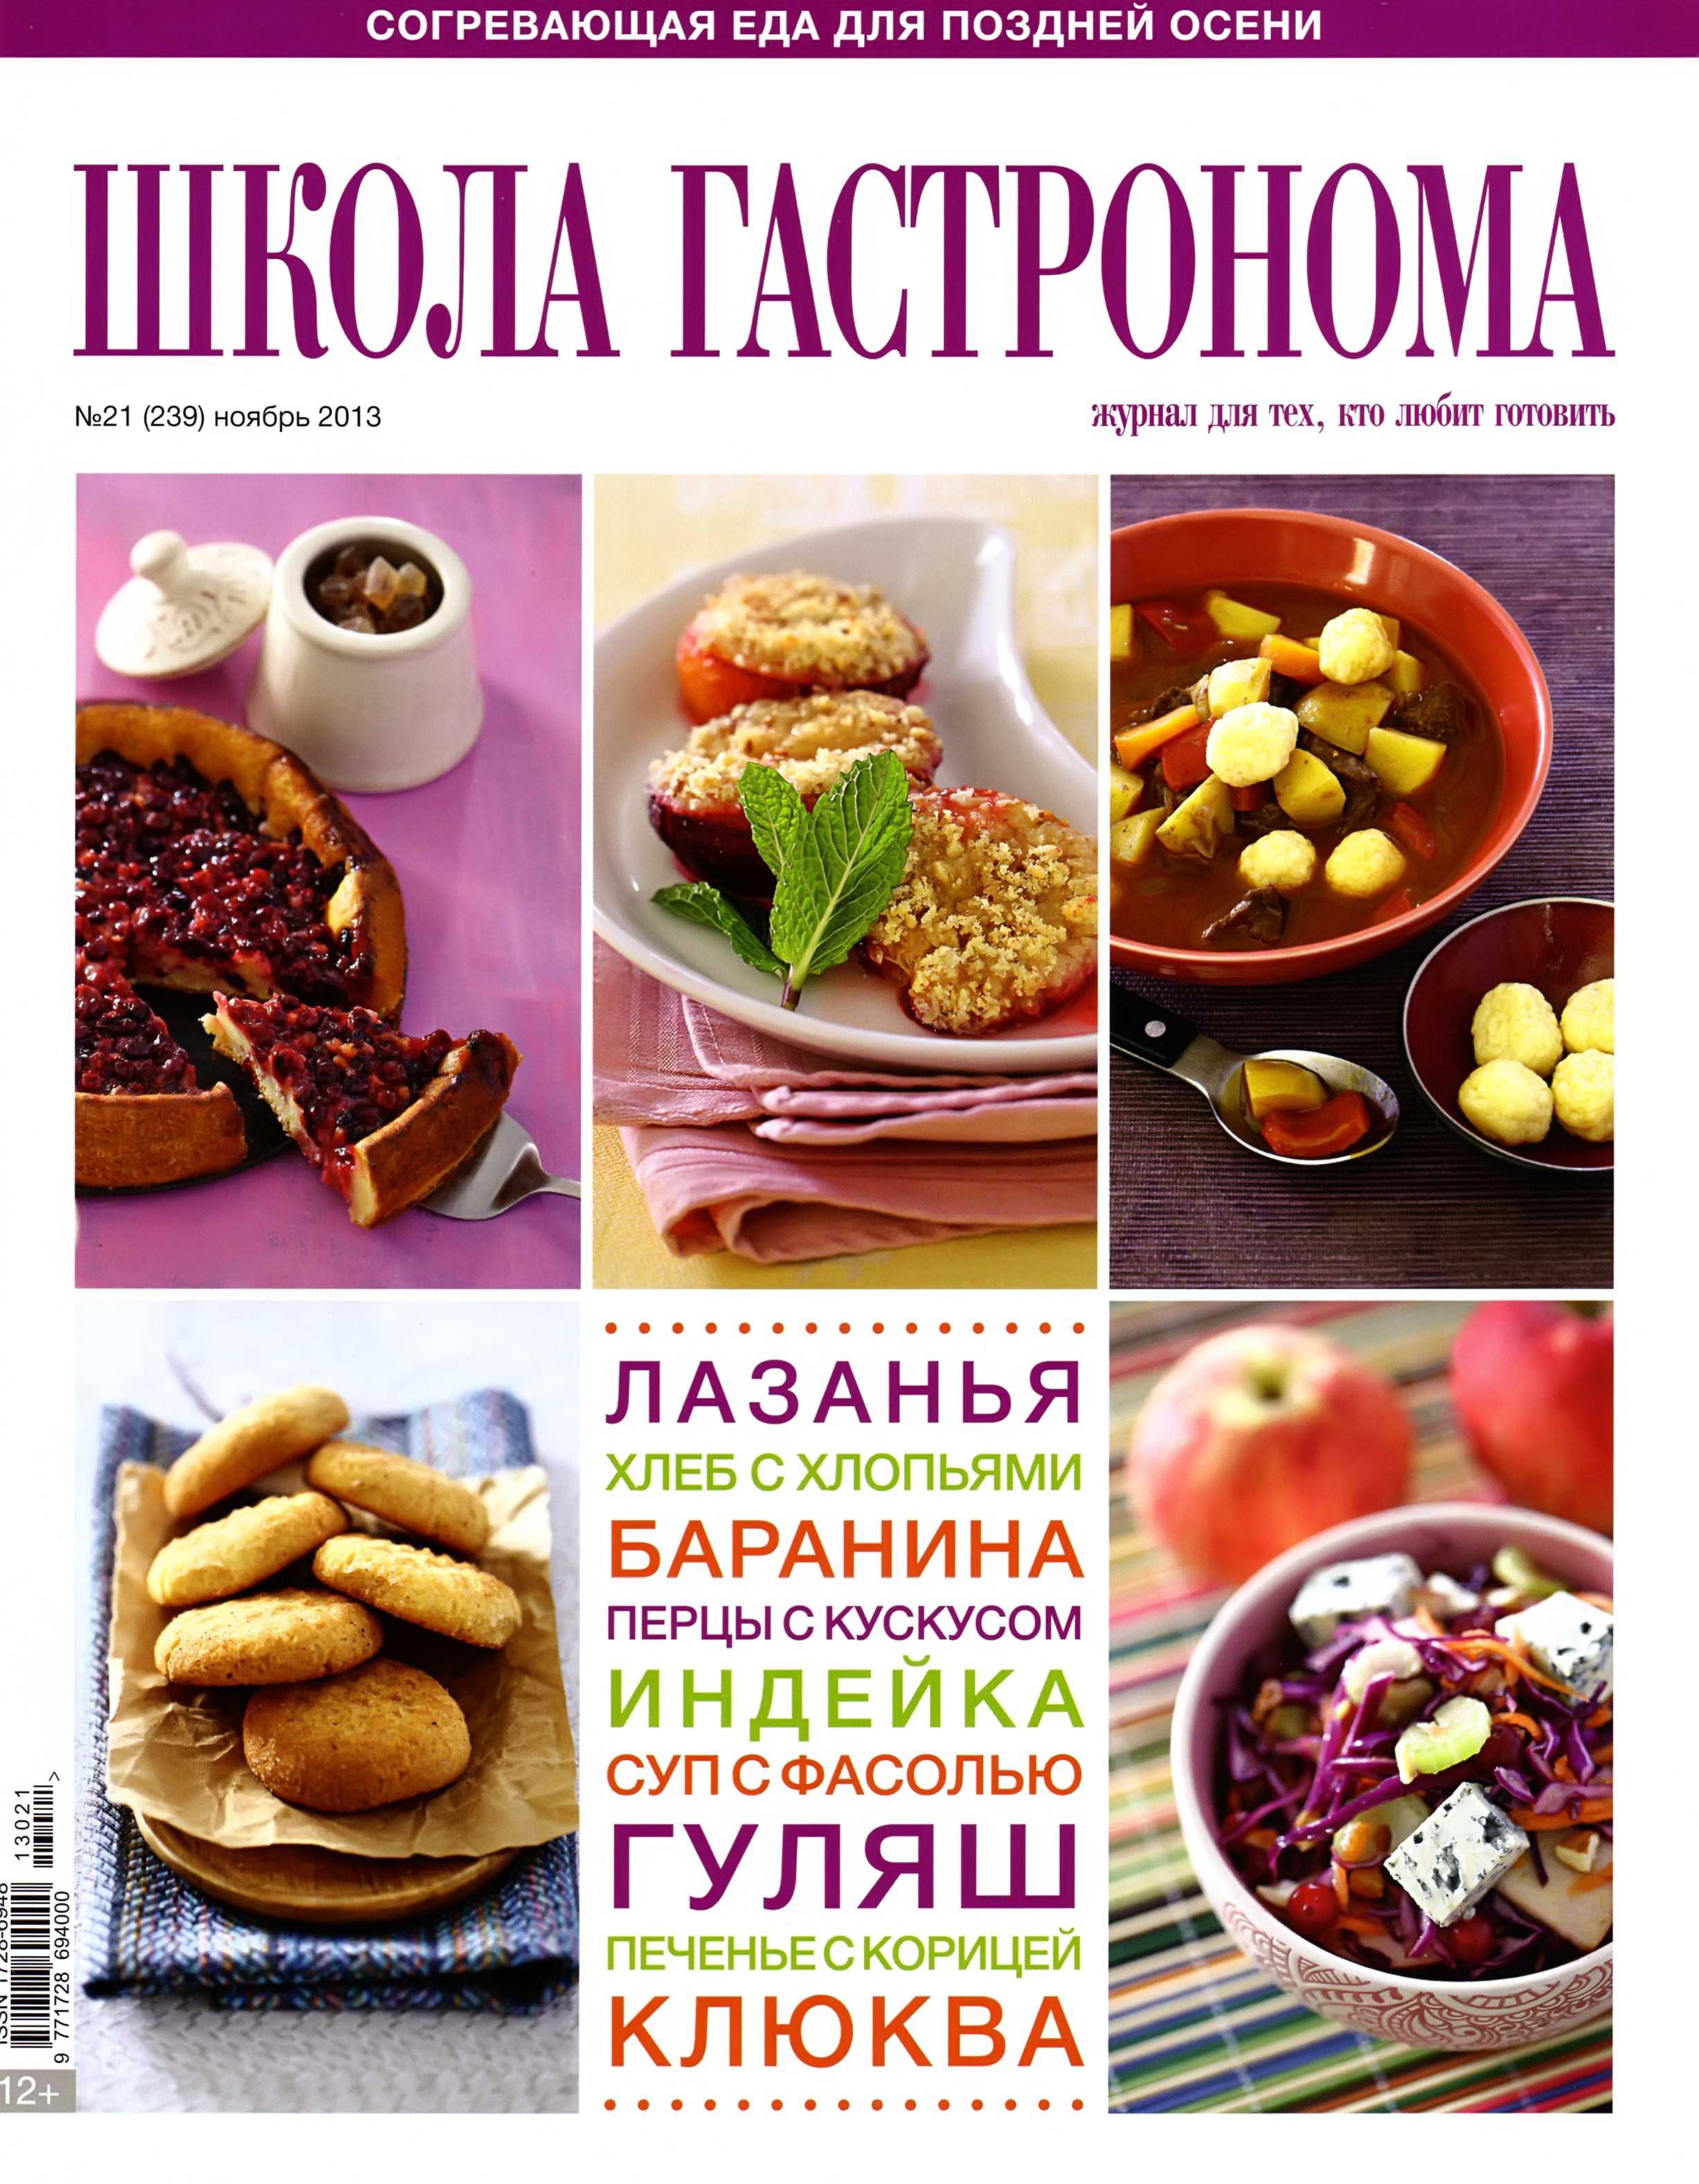 SHkola gastronoma    21 2013 goda Школа гастронома